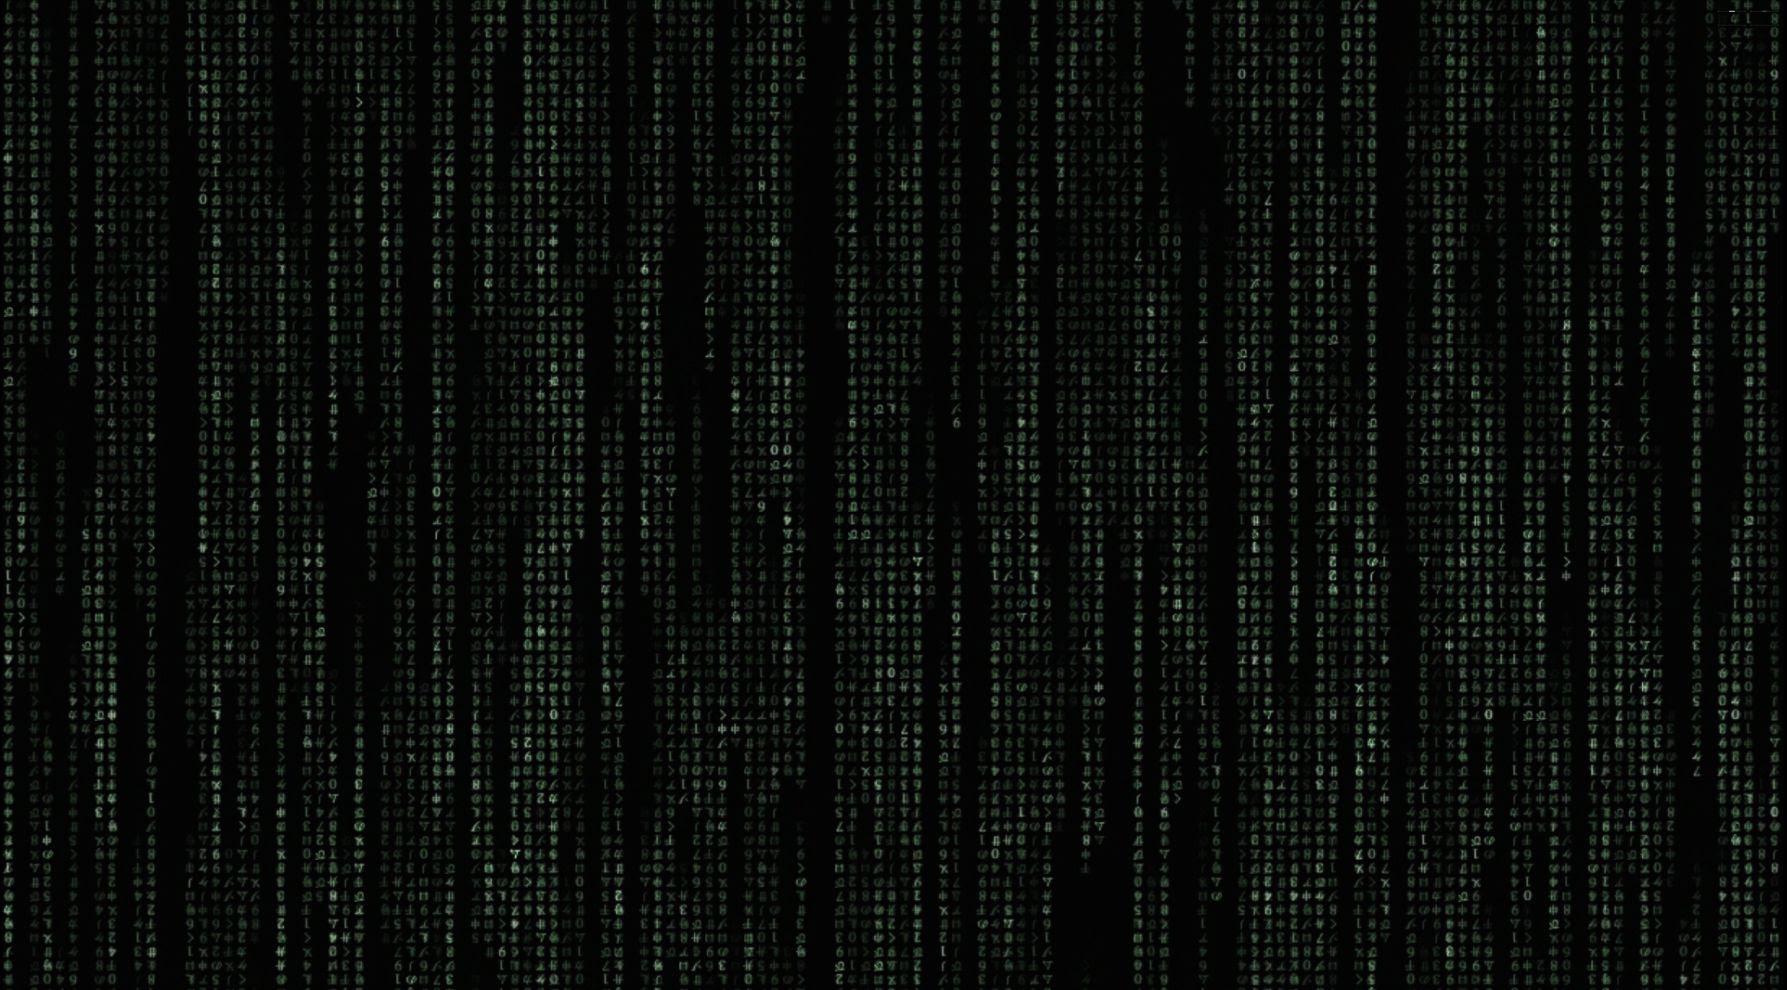 Unduh 1000+ Wallpaper Black Hd Video  Gratis